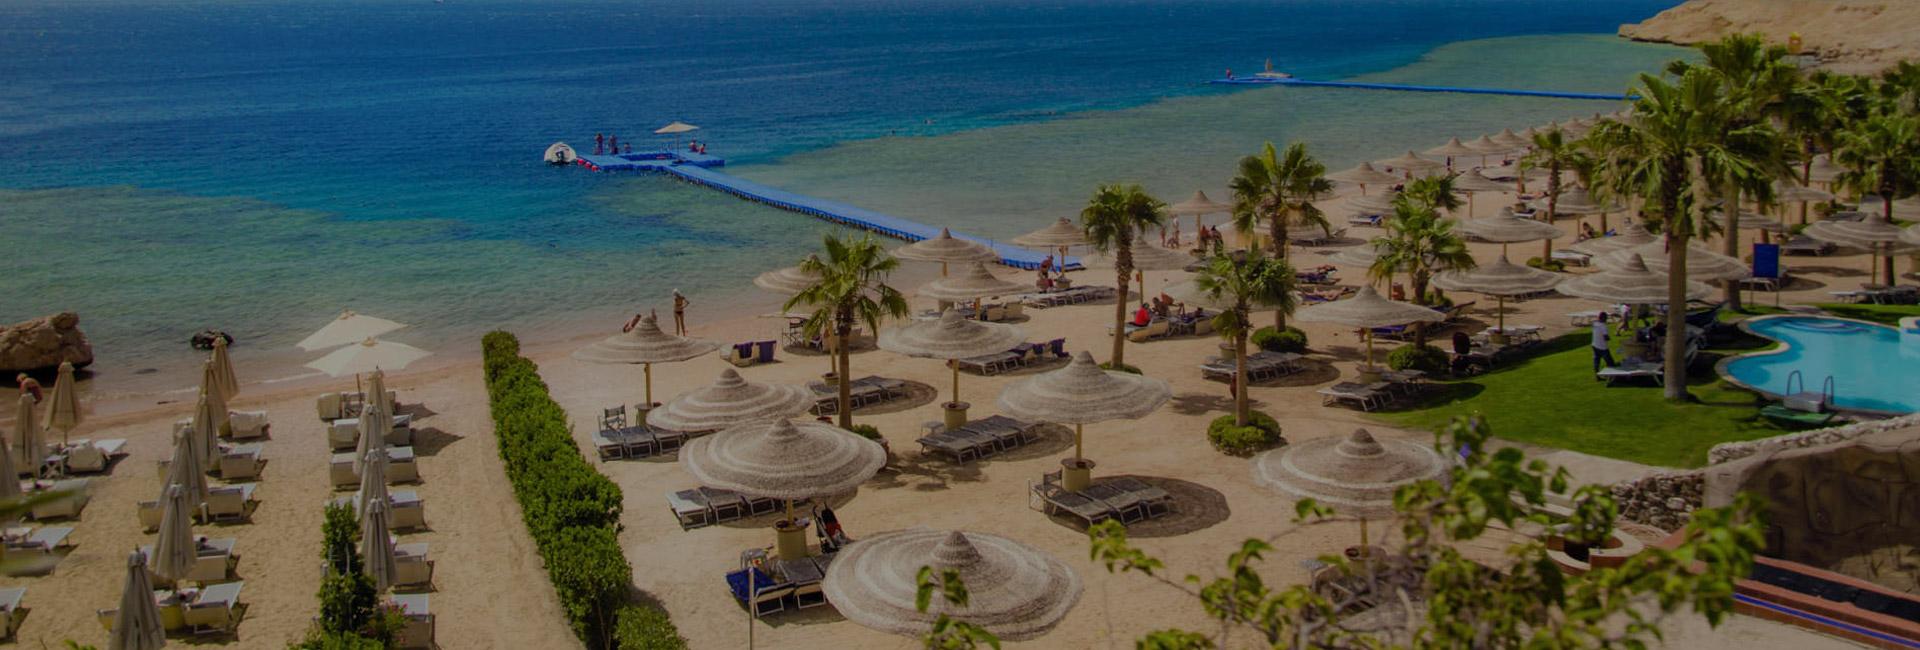 Cairo, Nile Cruise and Sharm El Sheikh